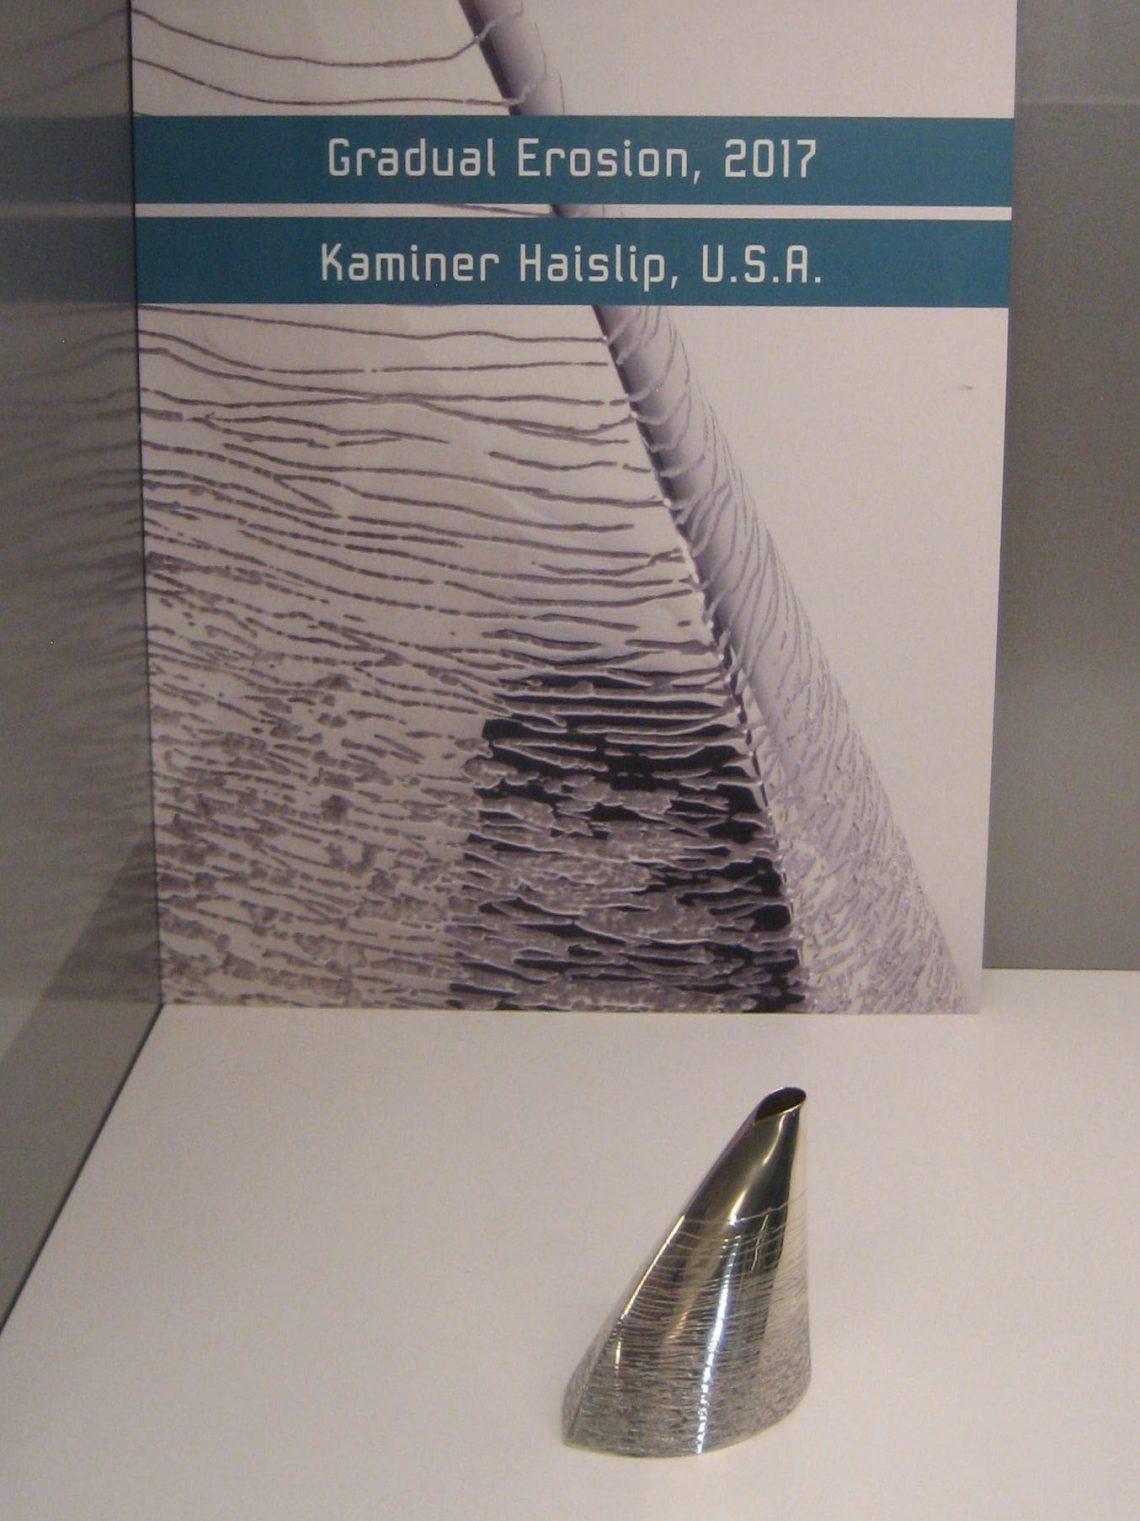 Kaminer Haislip, Gradual Erosion, 2017. Foto Esther Doornbusch, 29 maart 2019, CC BY 4.0